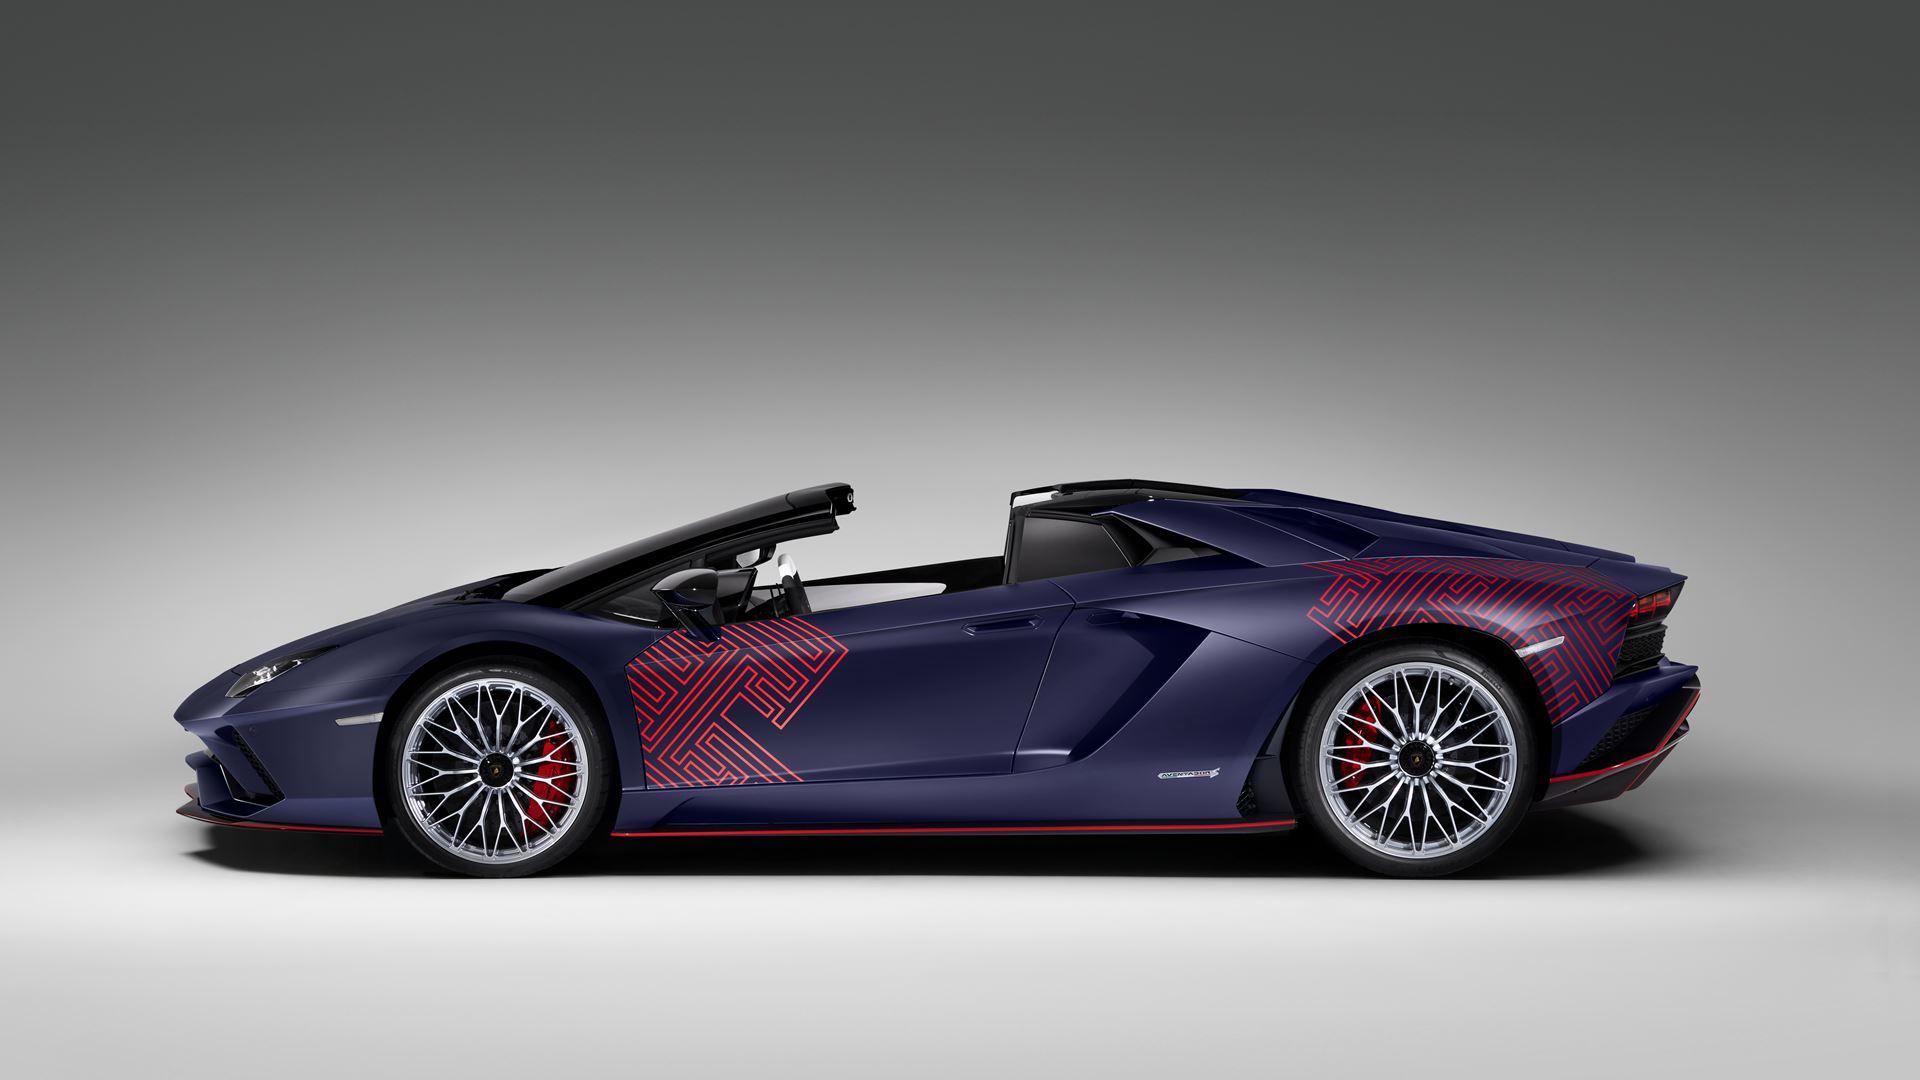 Lamborghini Seoul Unveils the Aventador S Roadster Korean Special Series - Image 3